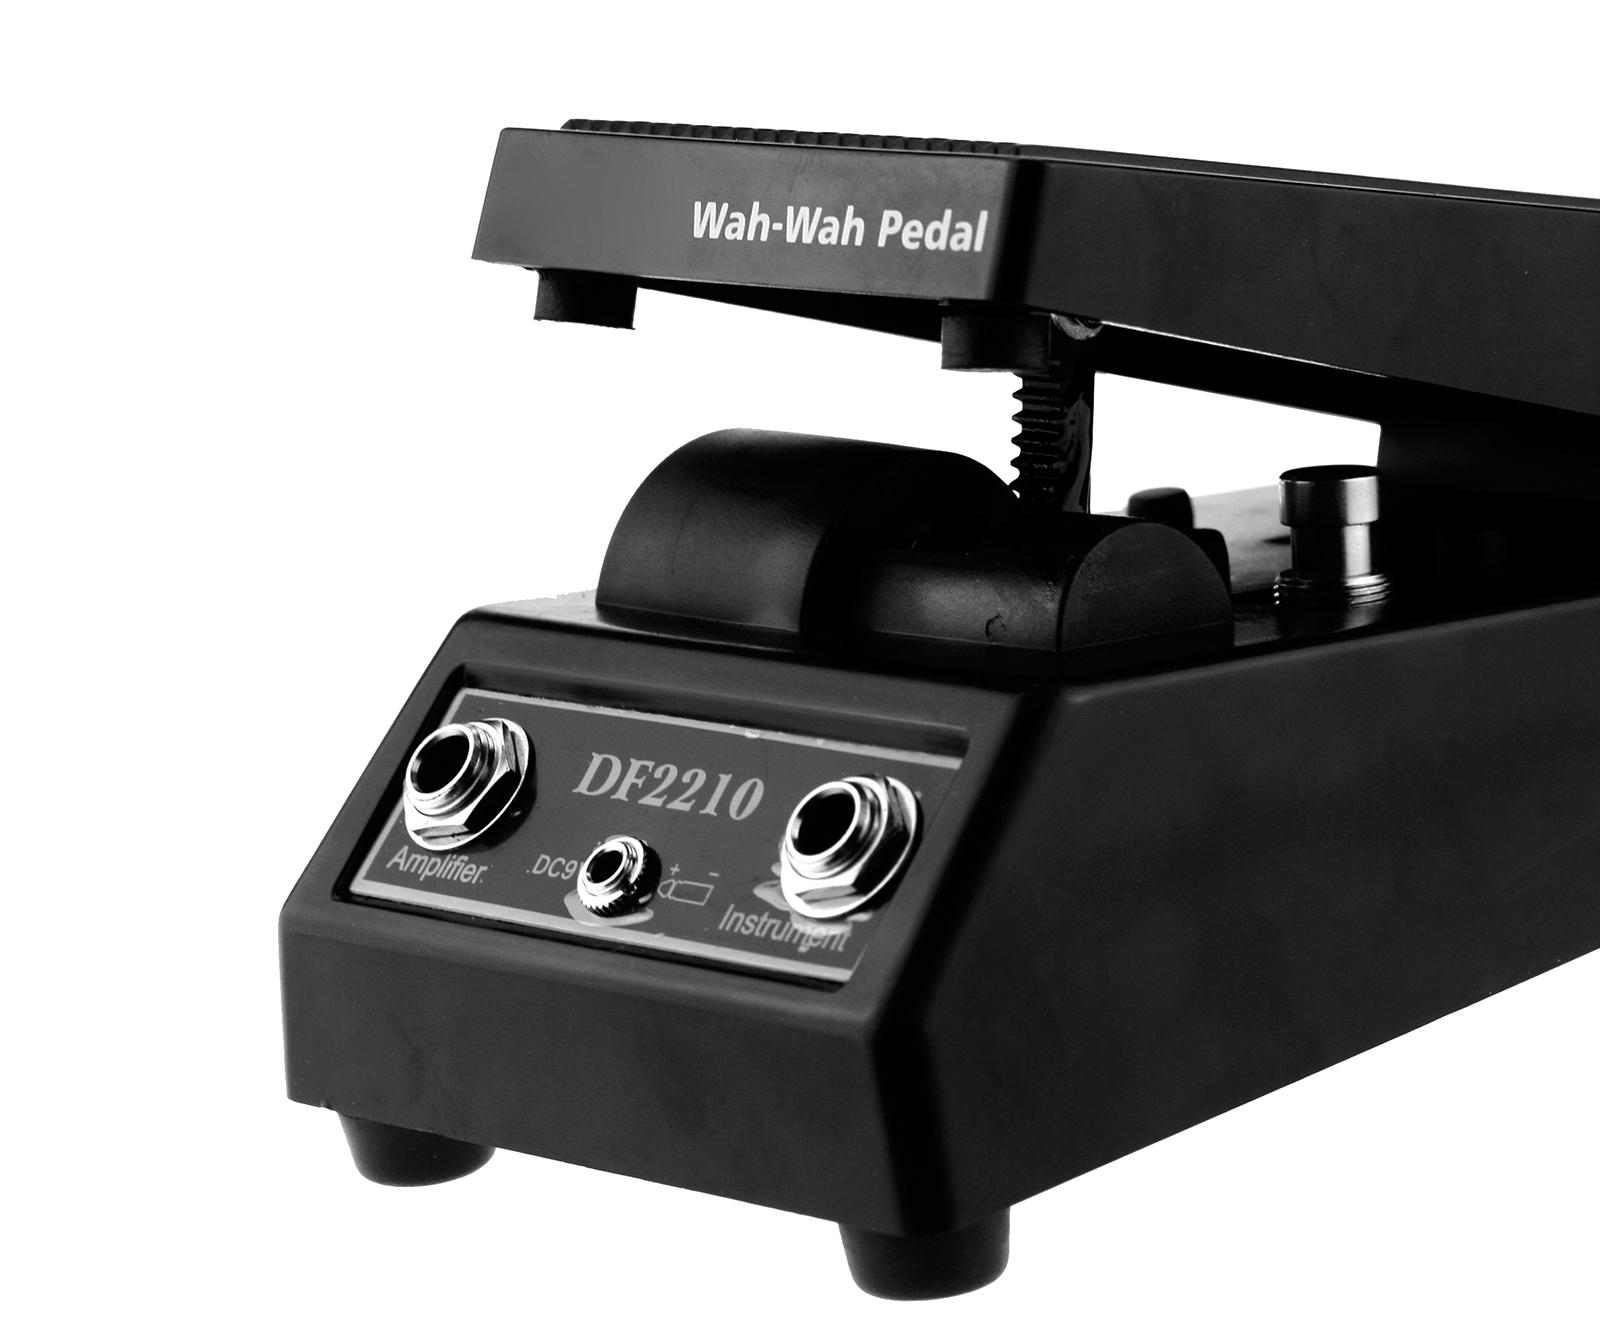 wah wah electric guitar effect fx pedal music black ebay. Black Bedroom Furniture Sets. Home Design Ideas